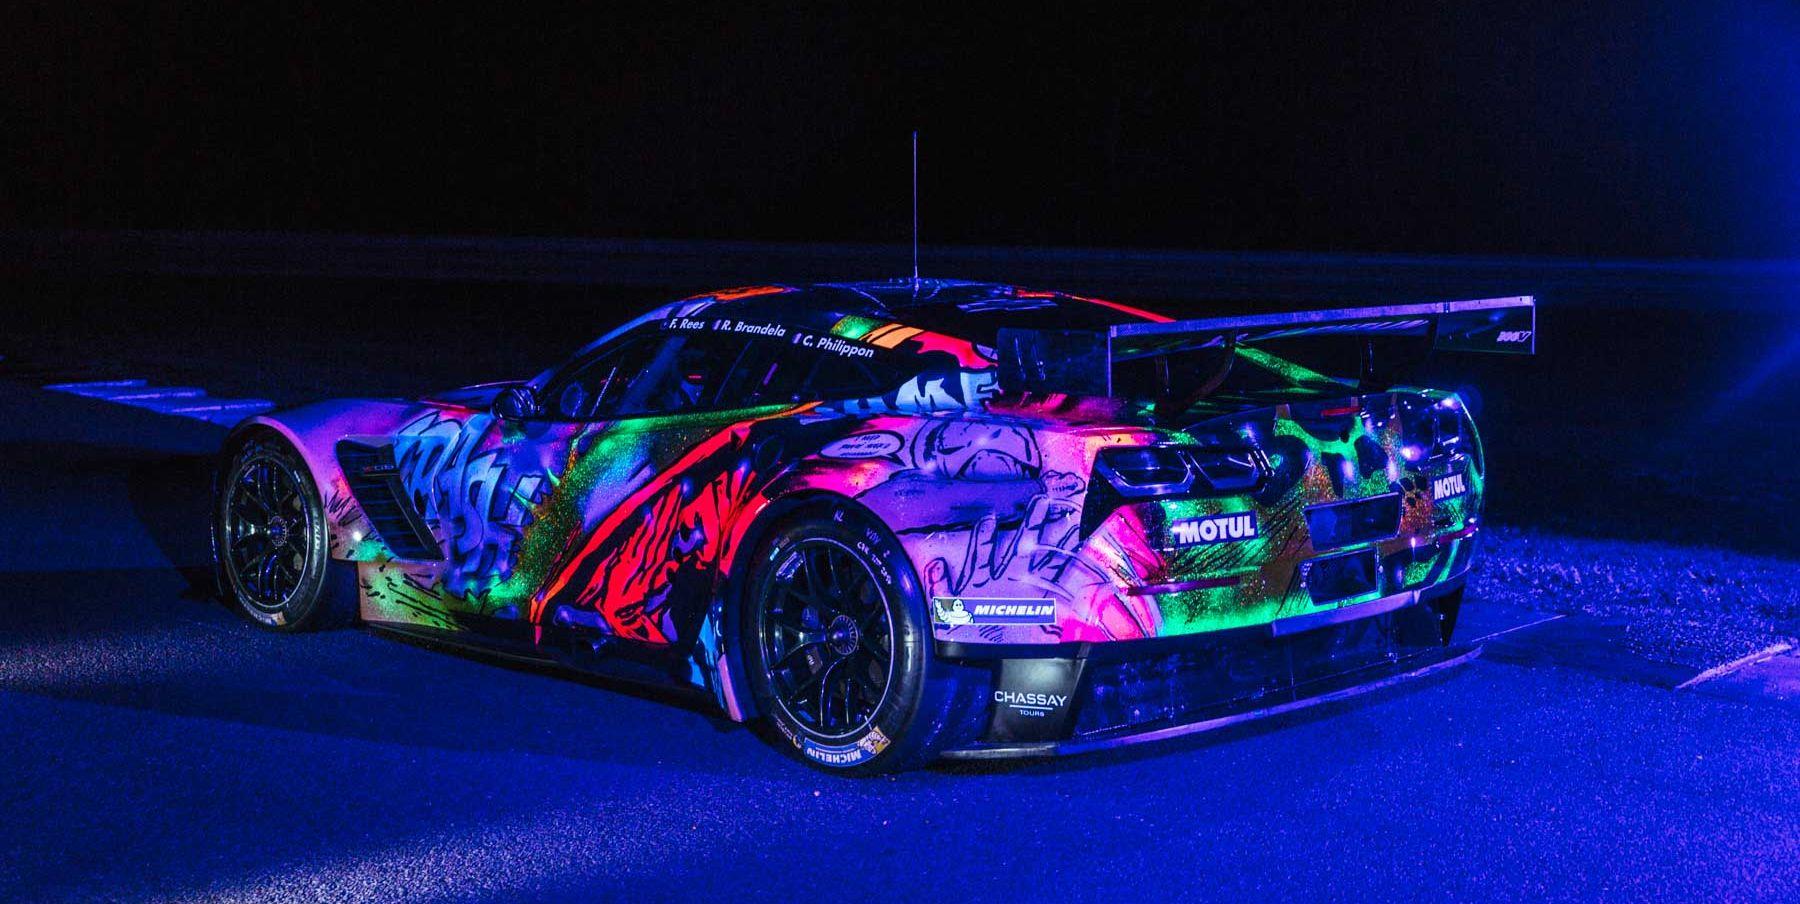 This Graffiti Covered Corvette Le Mans Race Car Is Beyond Cool